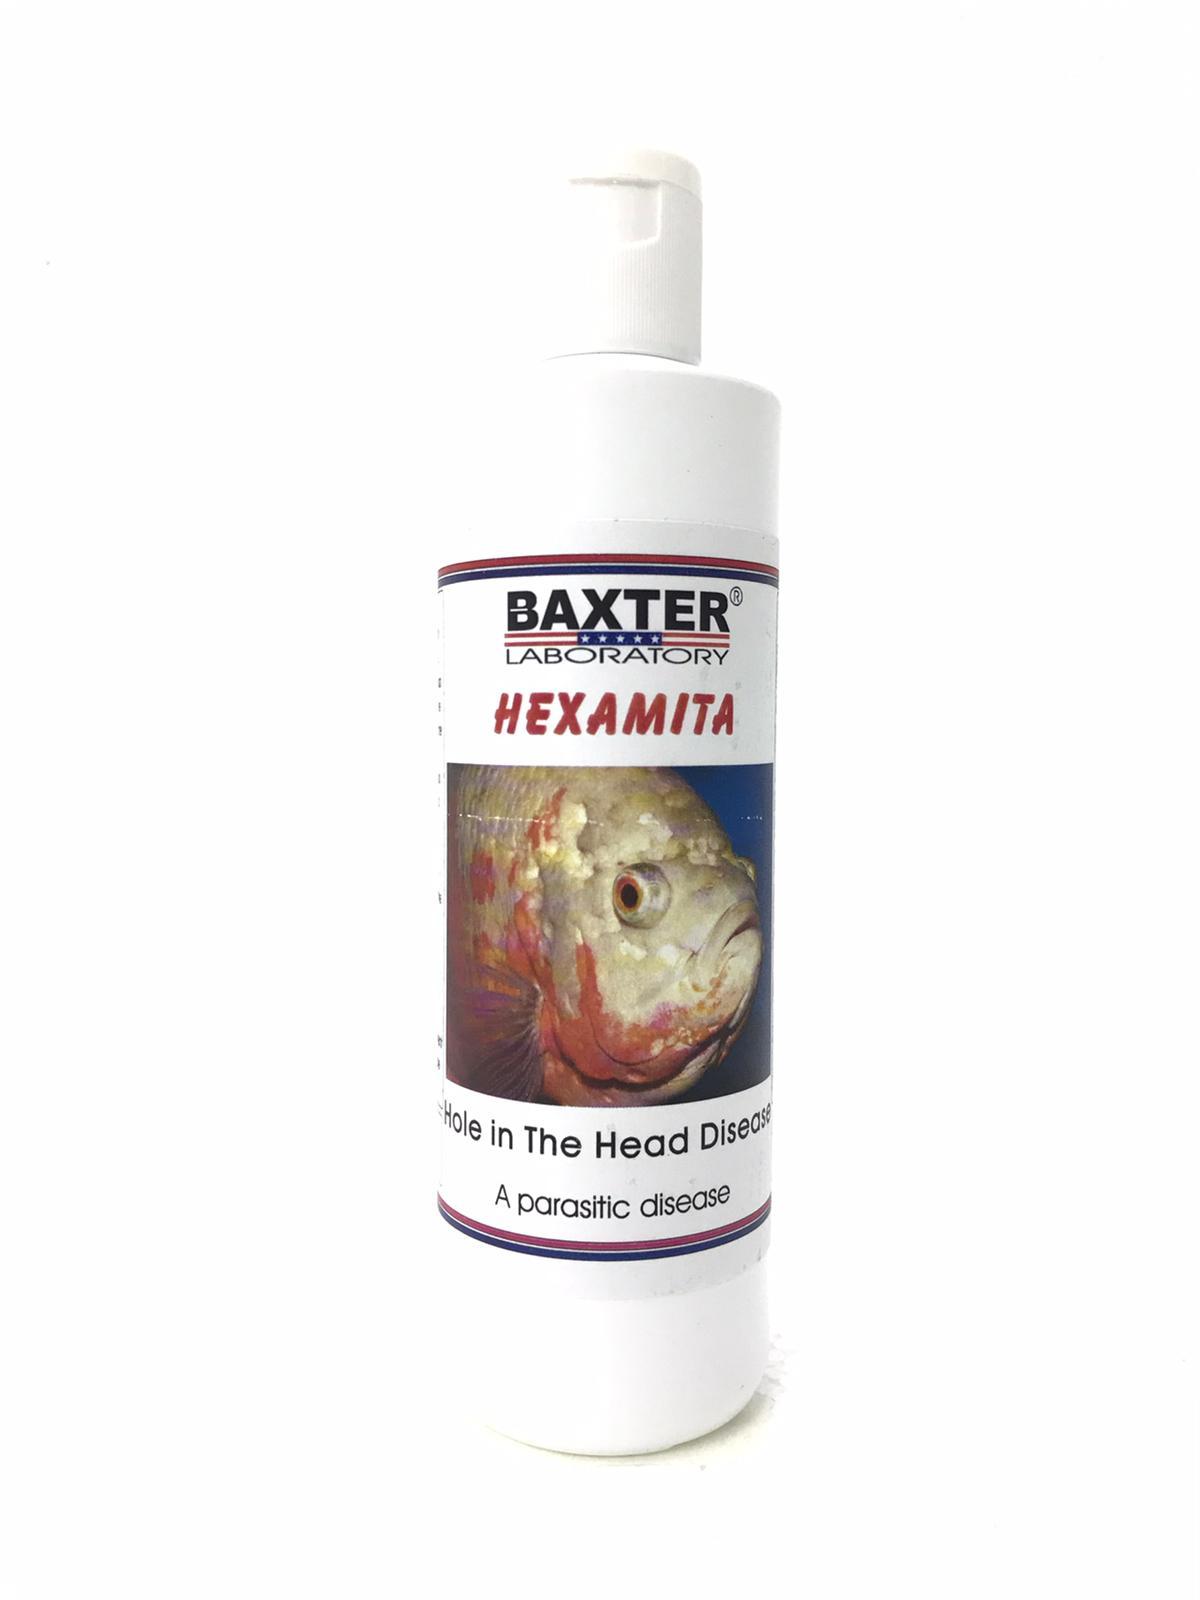 Baxter Hexamita